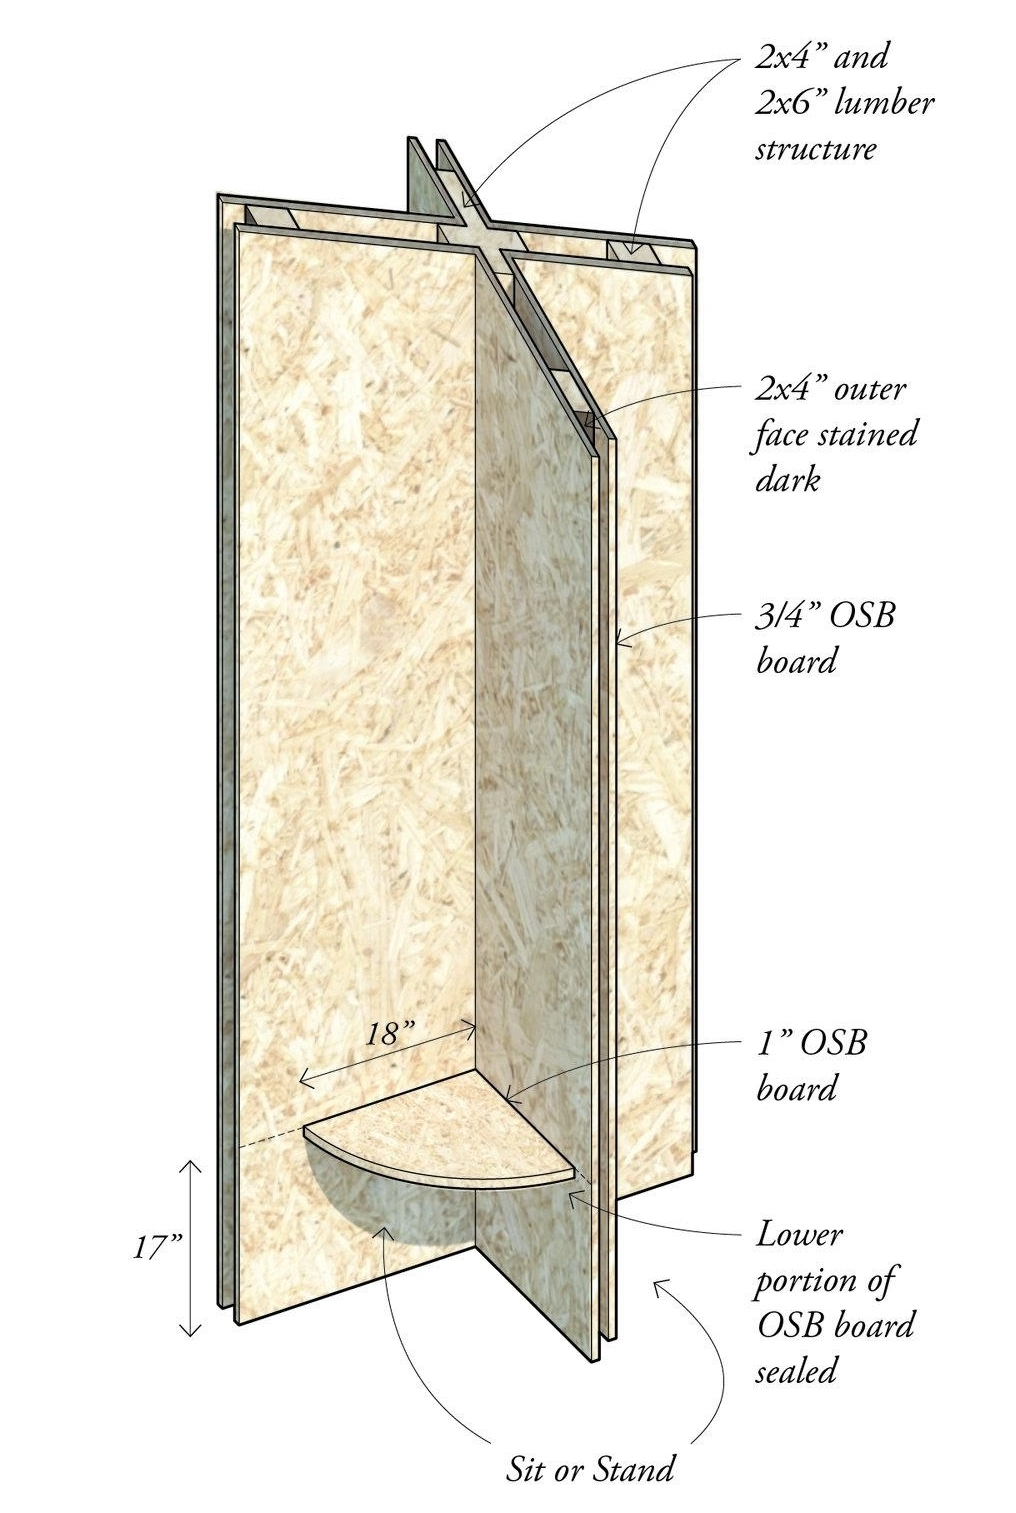 Typical prefab X-column